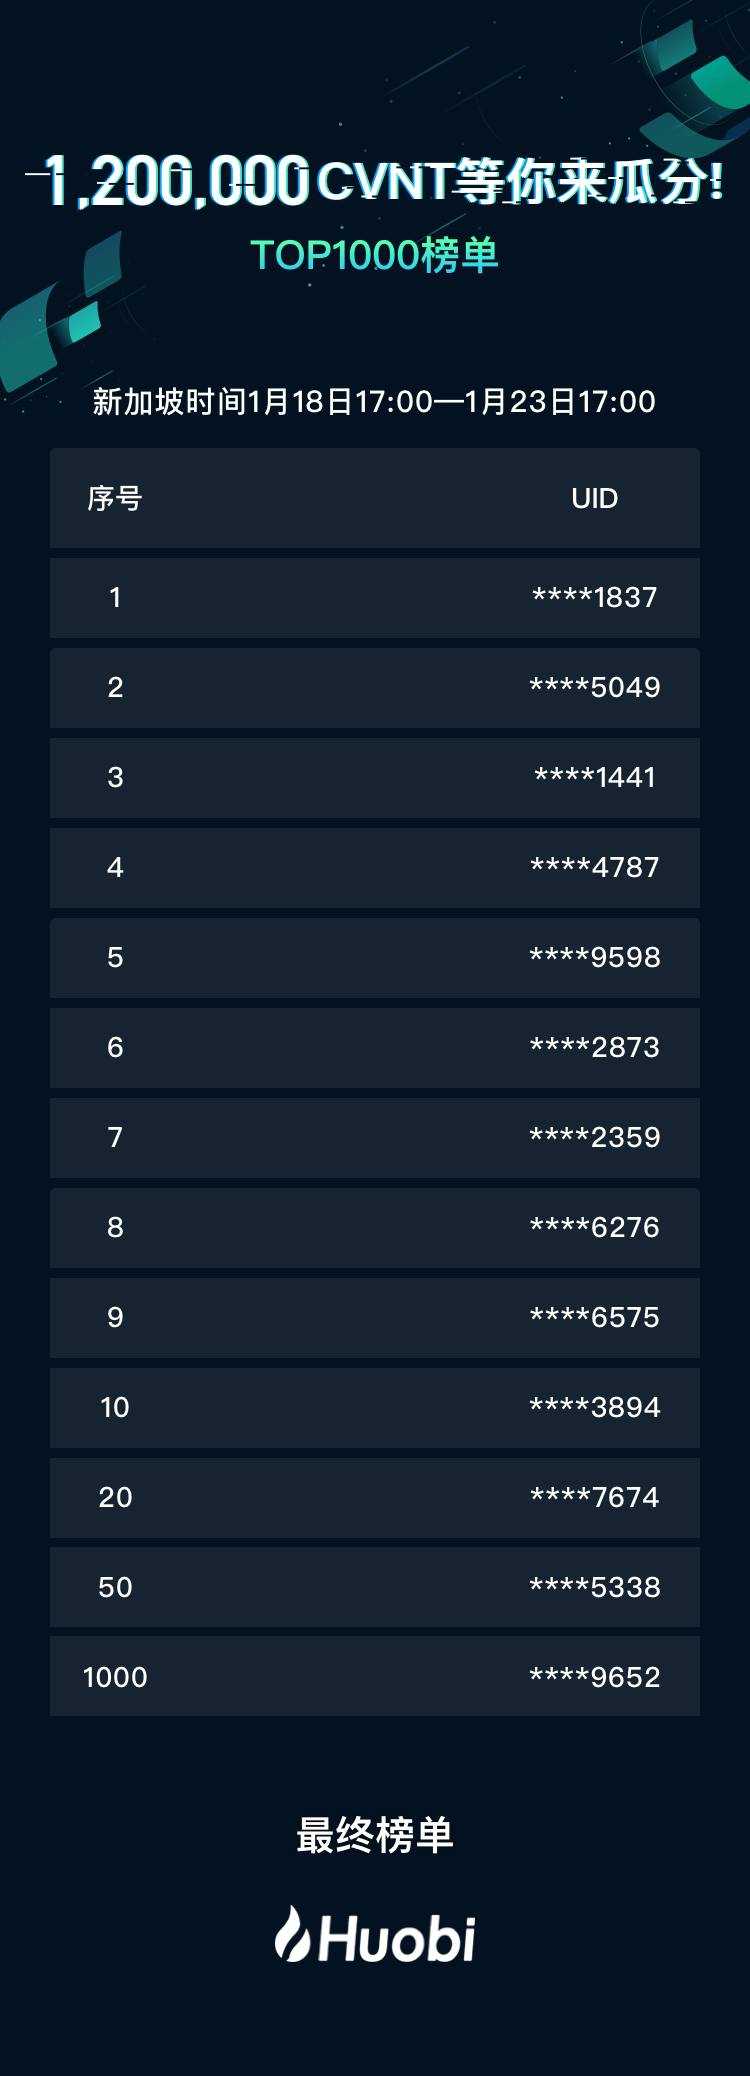 Trade_CVNT_to_Win_1.2_Million_CVNT_APP_CN_Copy_3.png